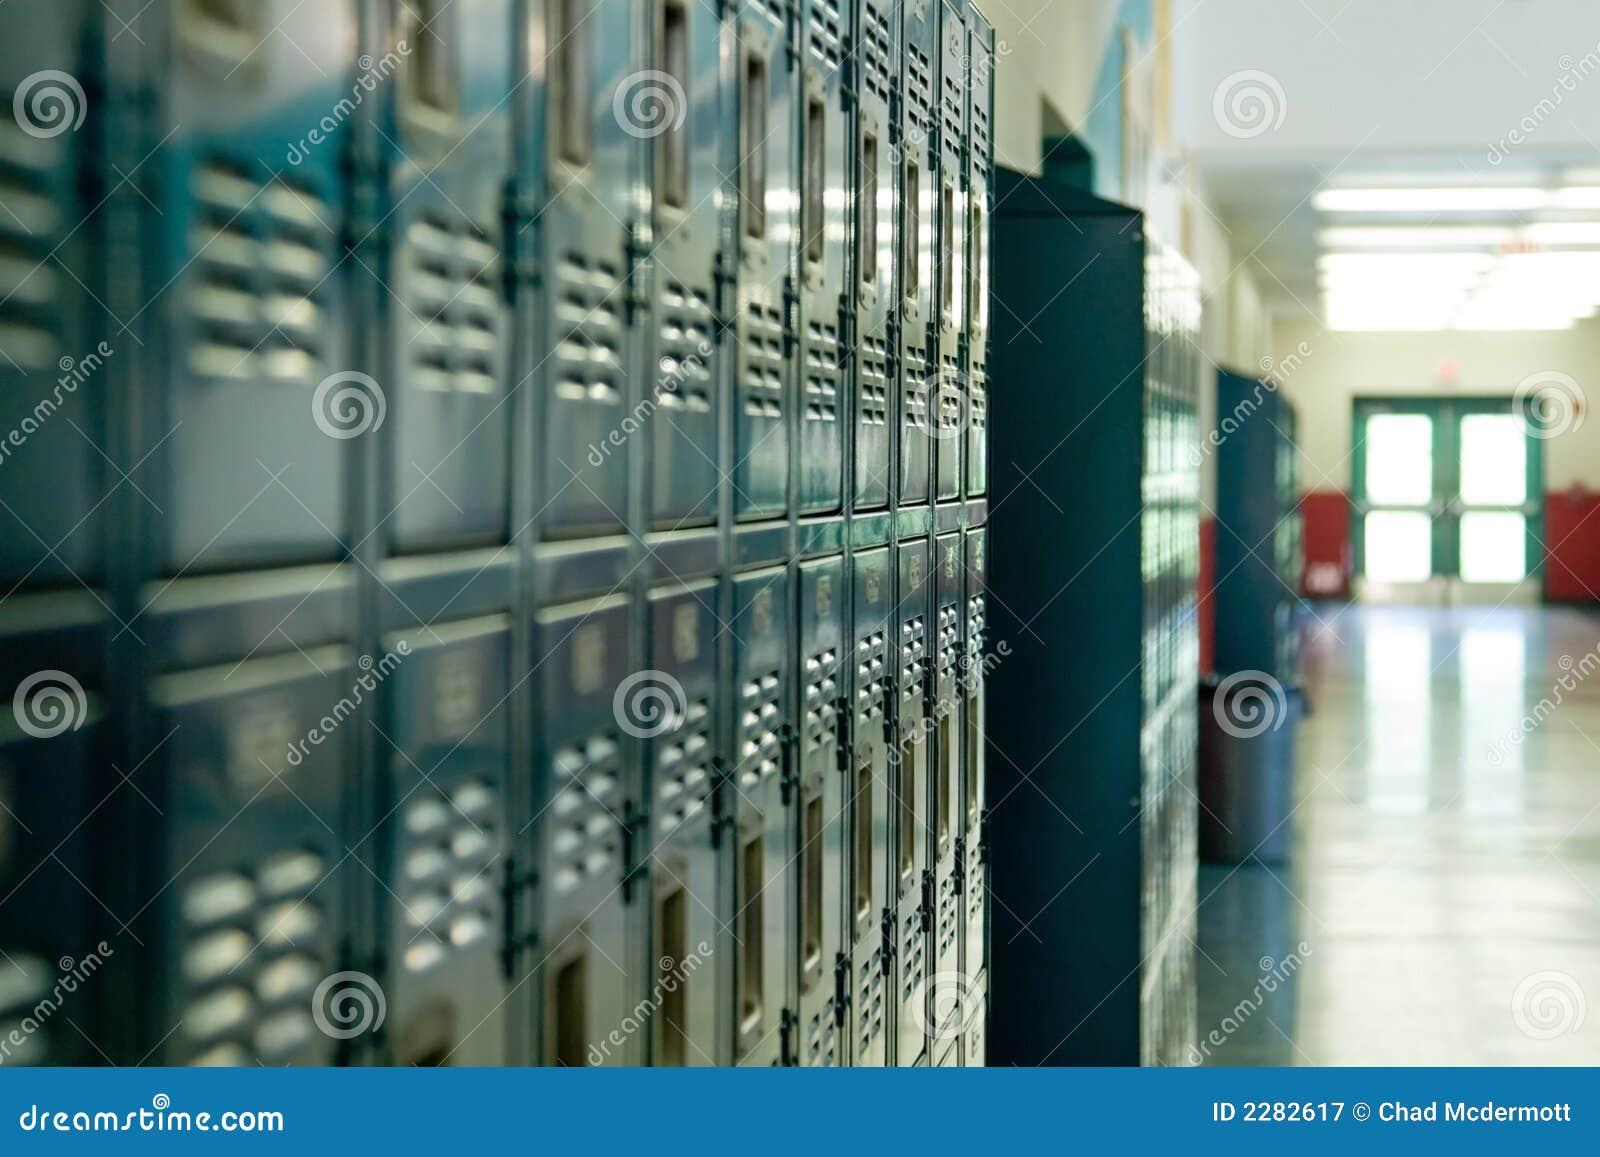 School Lockers stock image. Image of student, educate ...